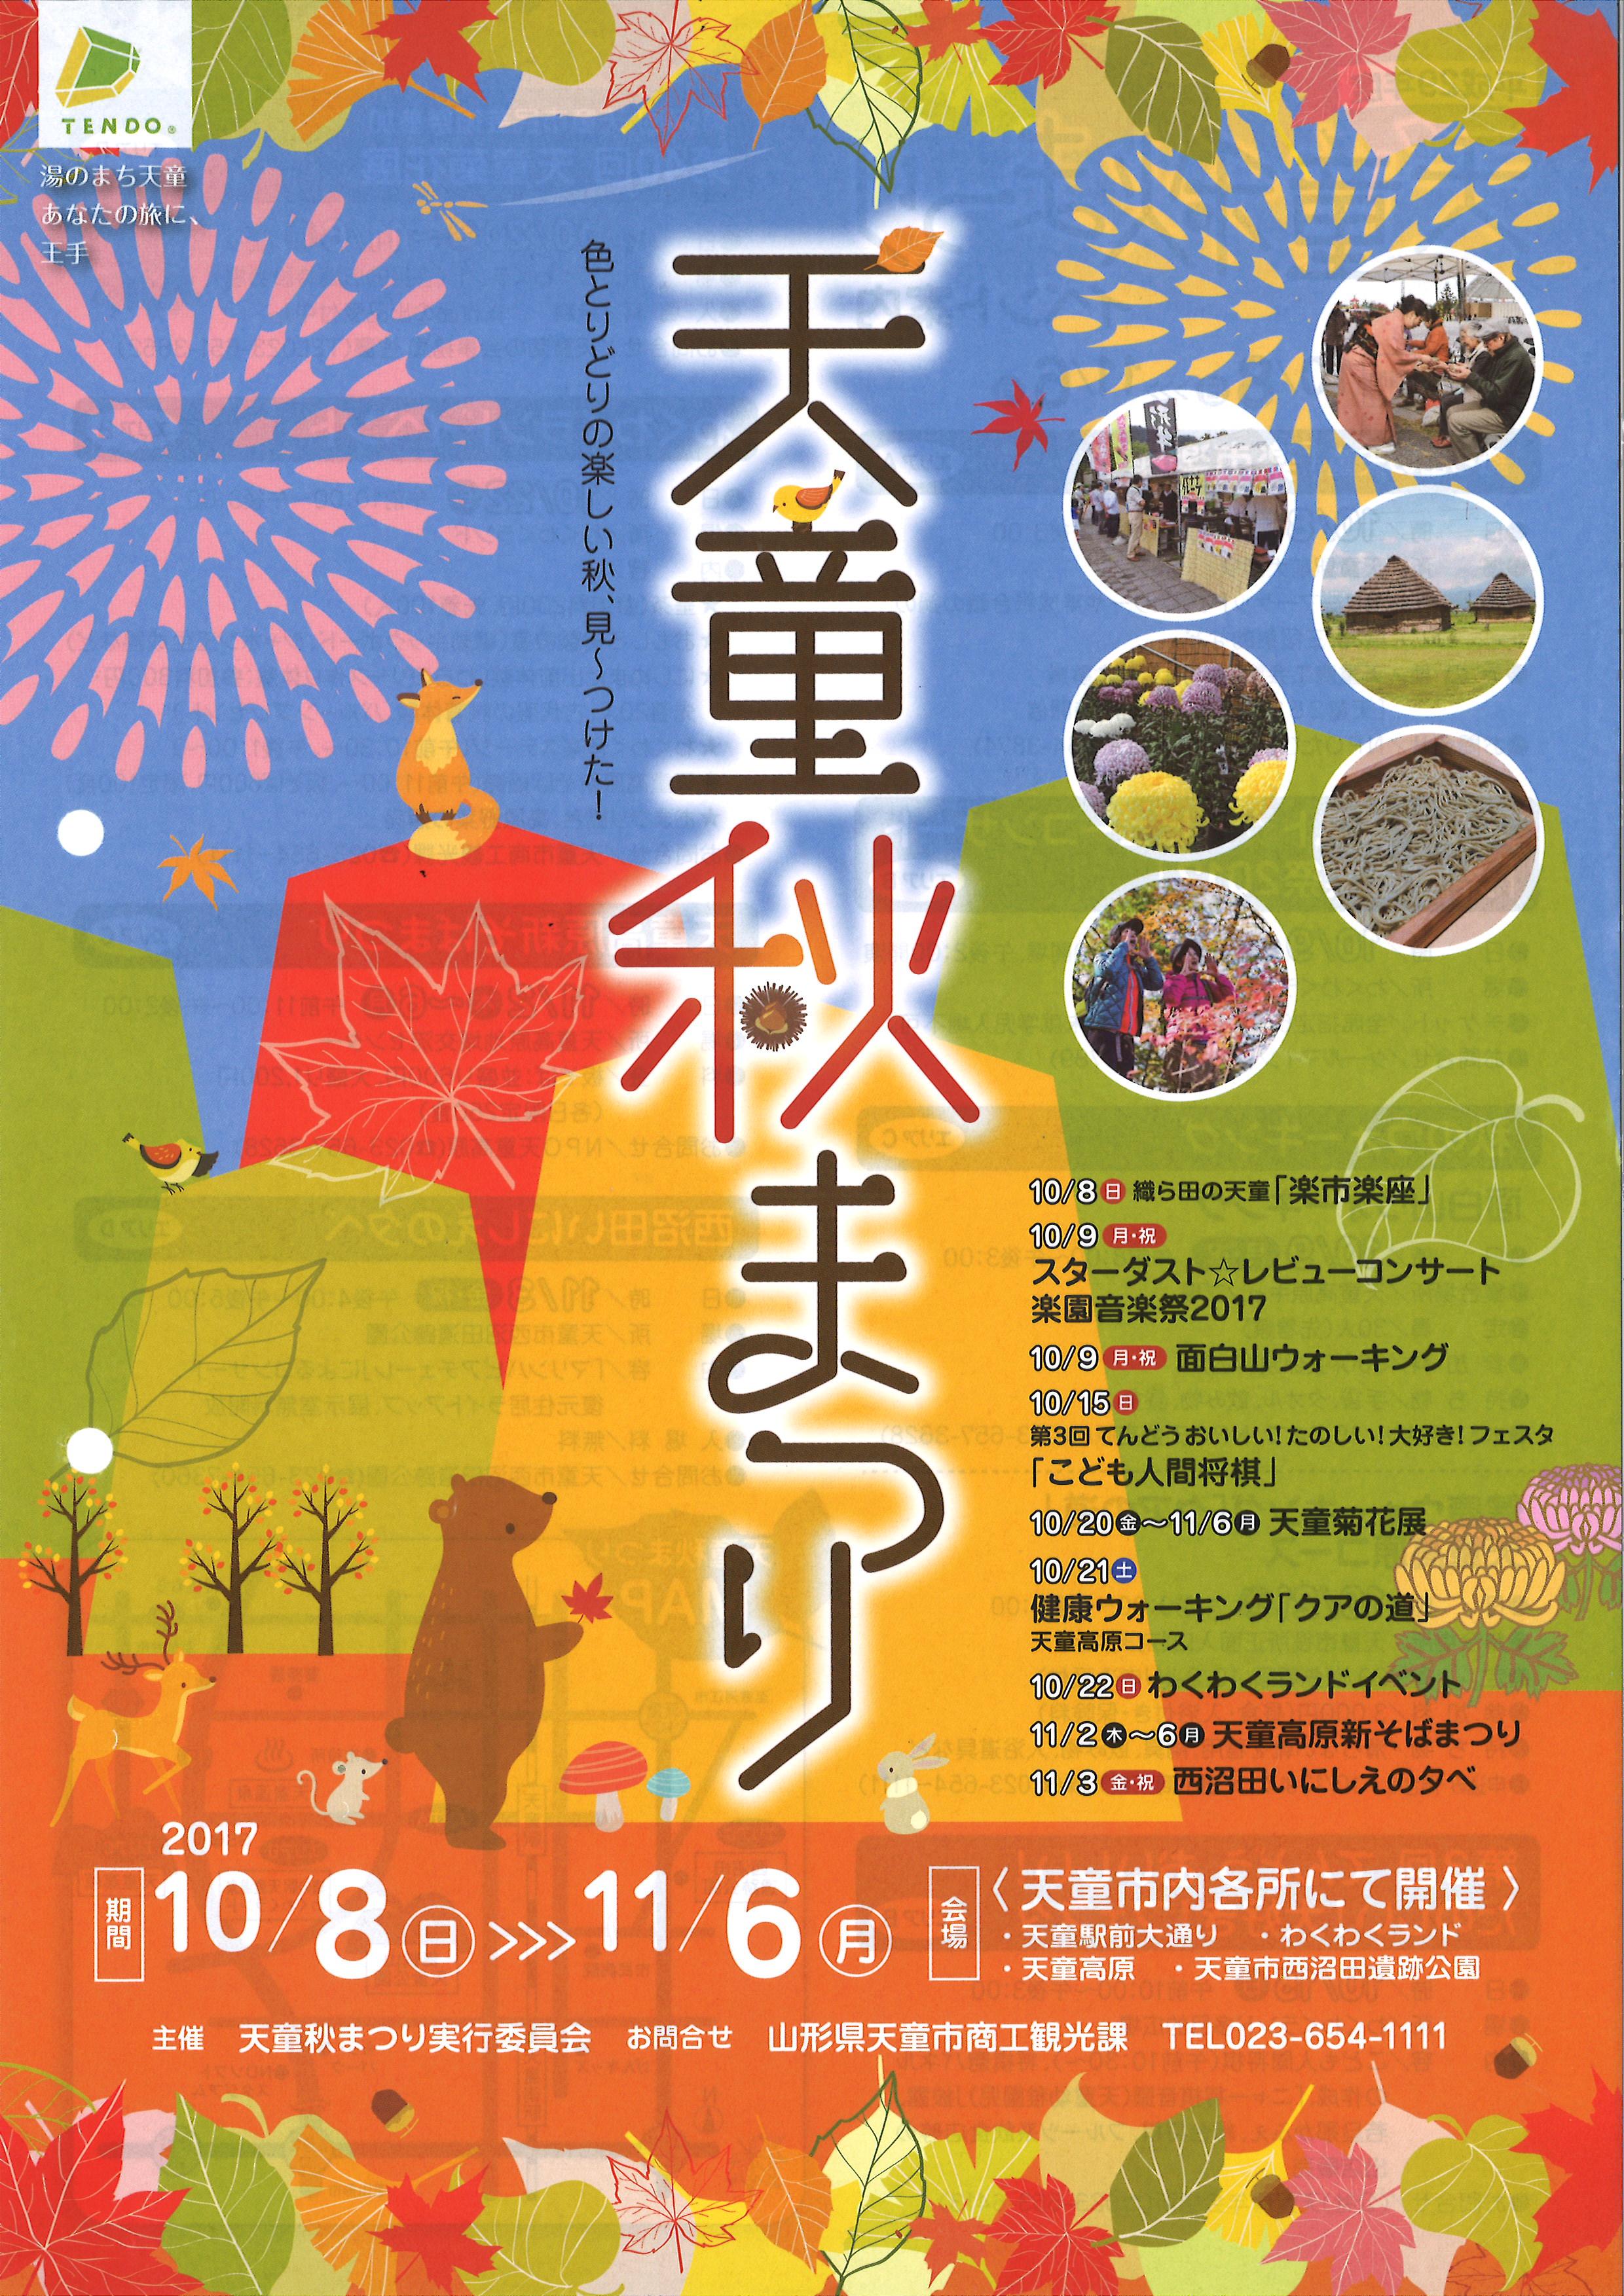 ☆2017 Tendo autumn festival ☆: Image